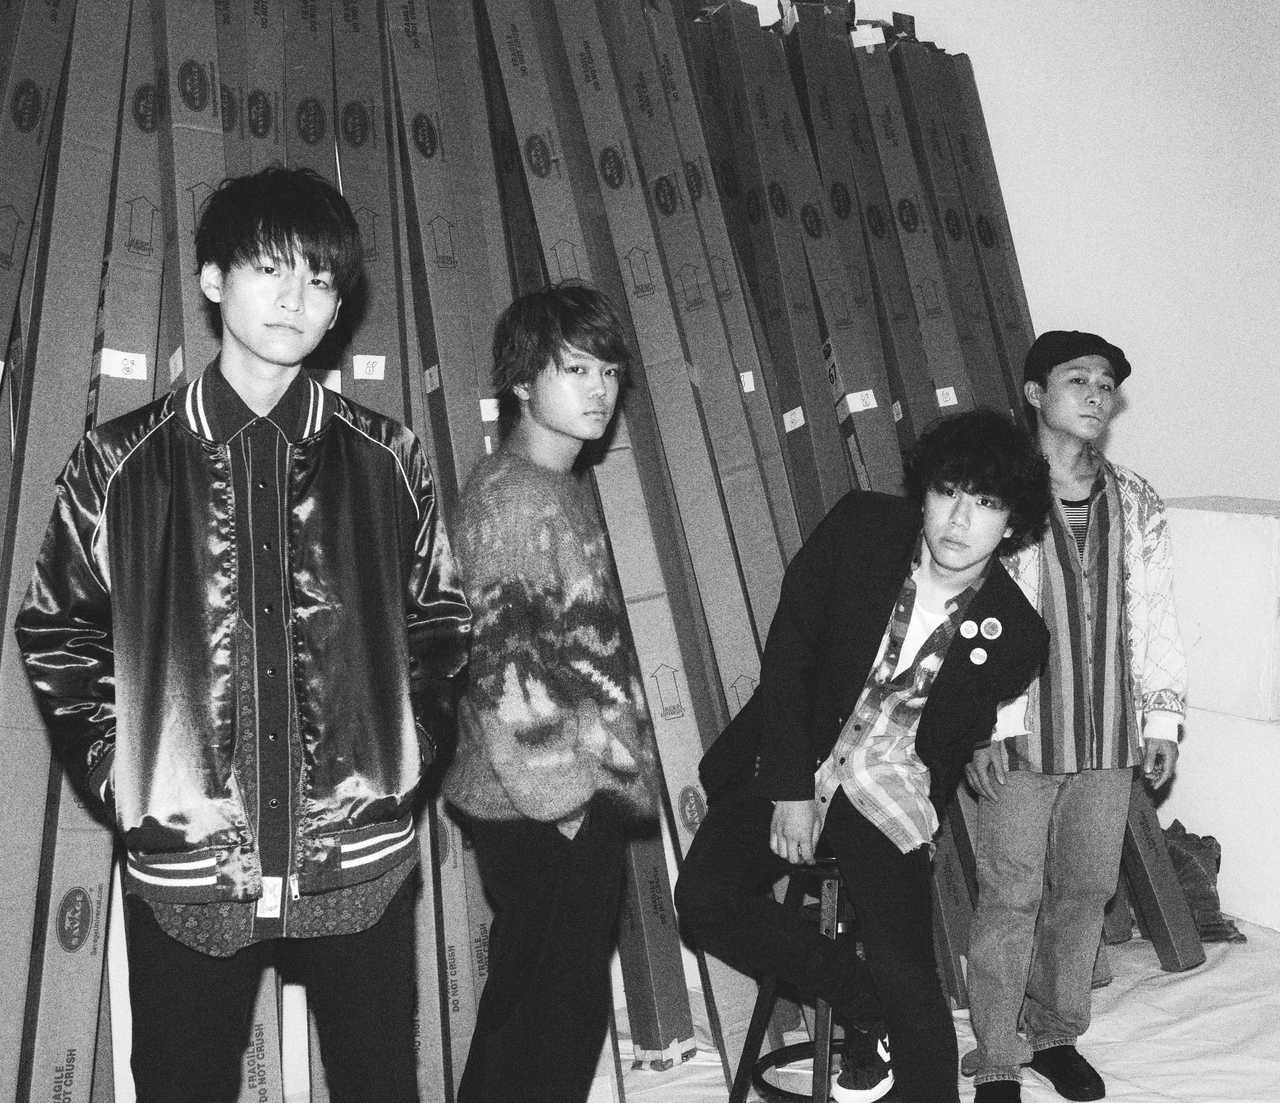 L→R 小川真司 (Gu&Cho)、白山治輝(Ba&Cho)、森 良太(Vo&Gu)、田中駿汰(Dr&Cho)